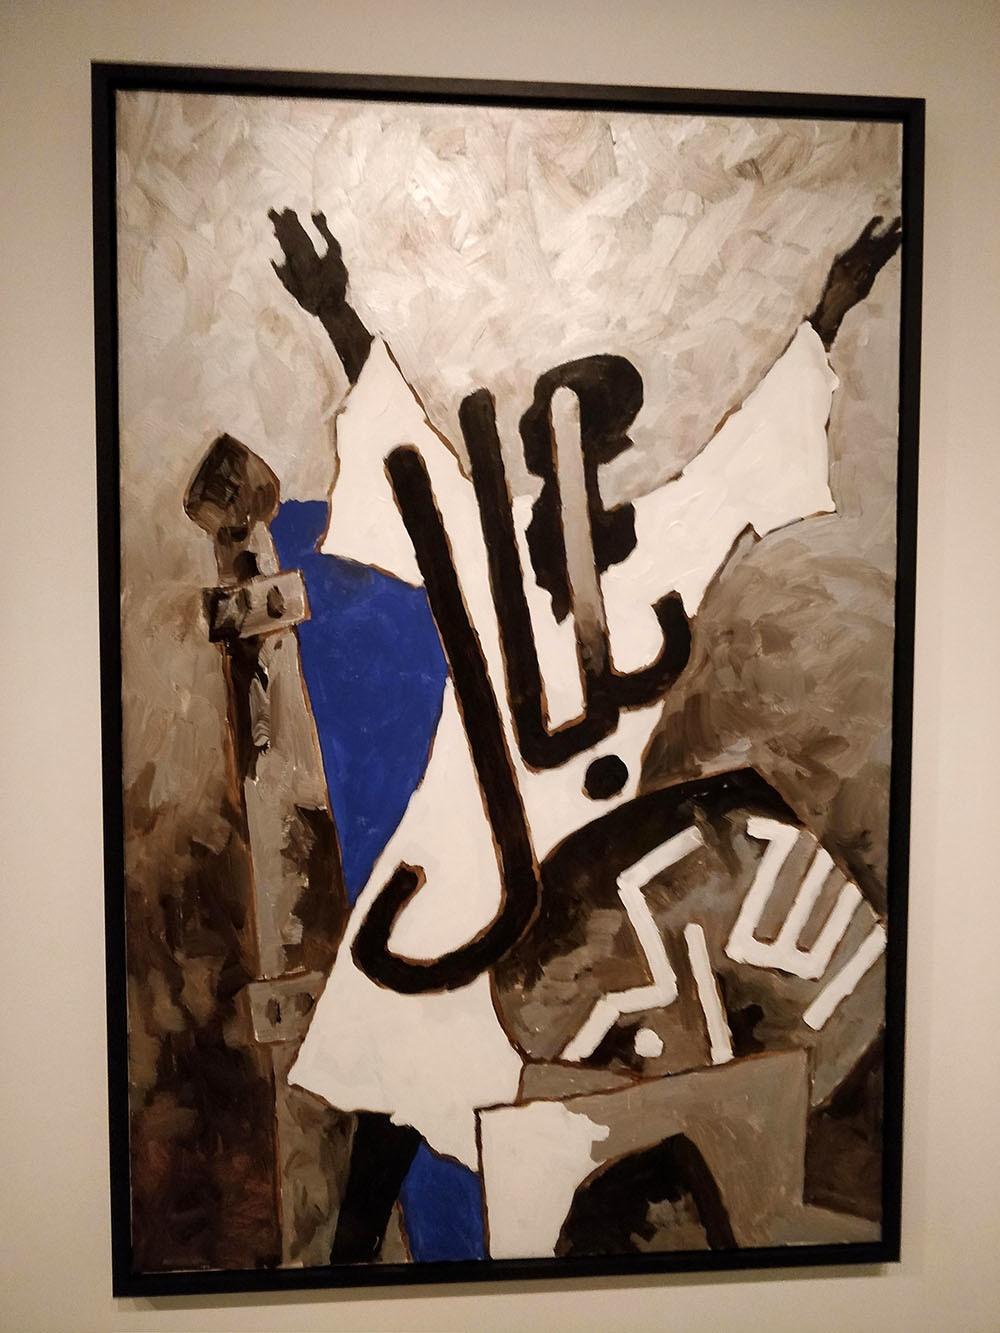 """Bilal ibn Rabah"", 2008. Acrylic on canvas. Qatar Foundation Collection Doha.—Photo by author"